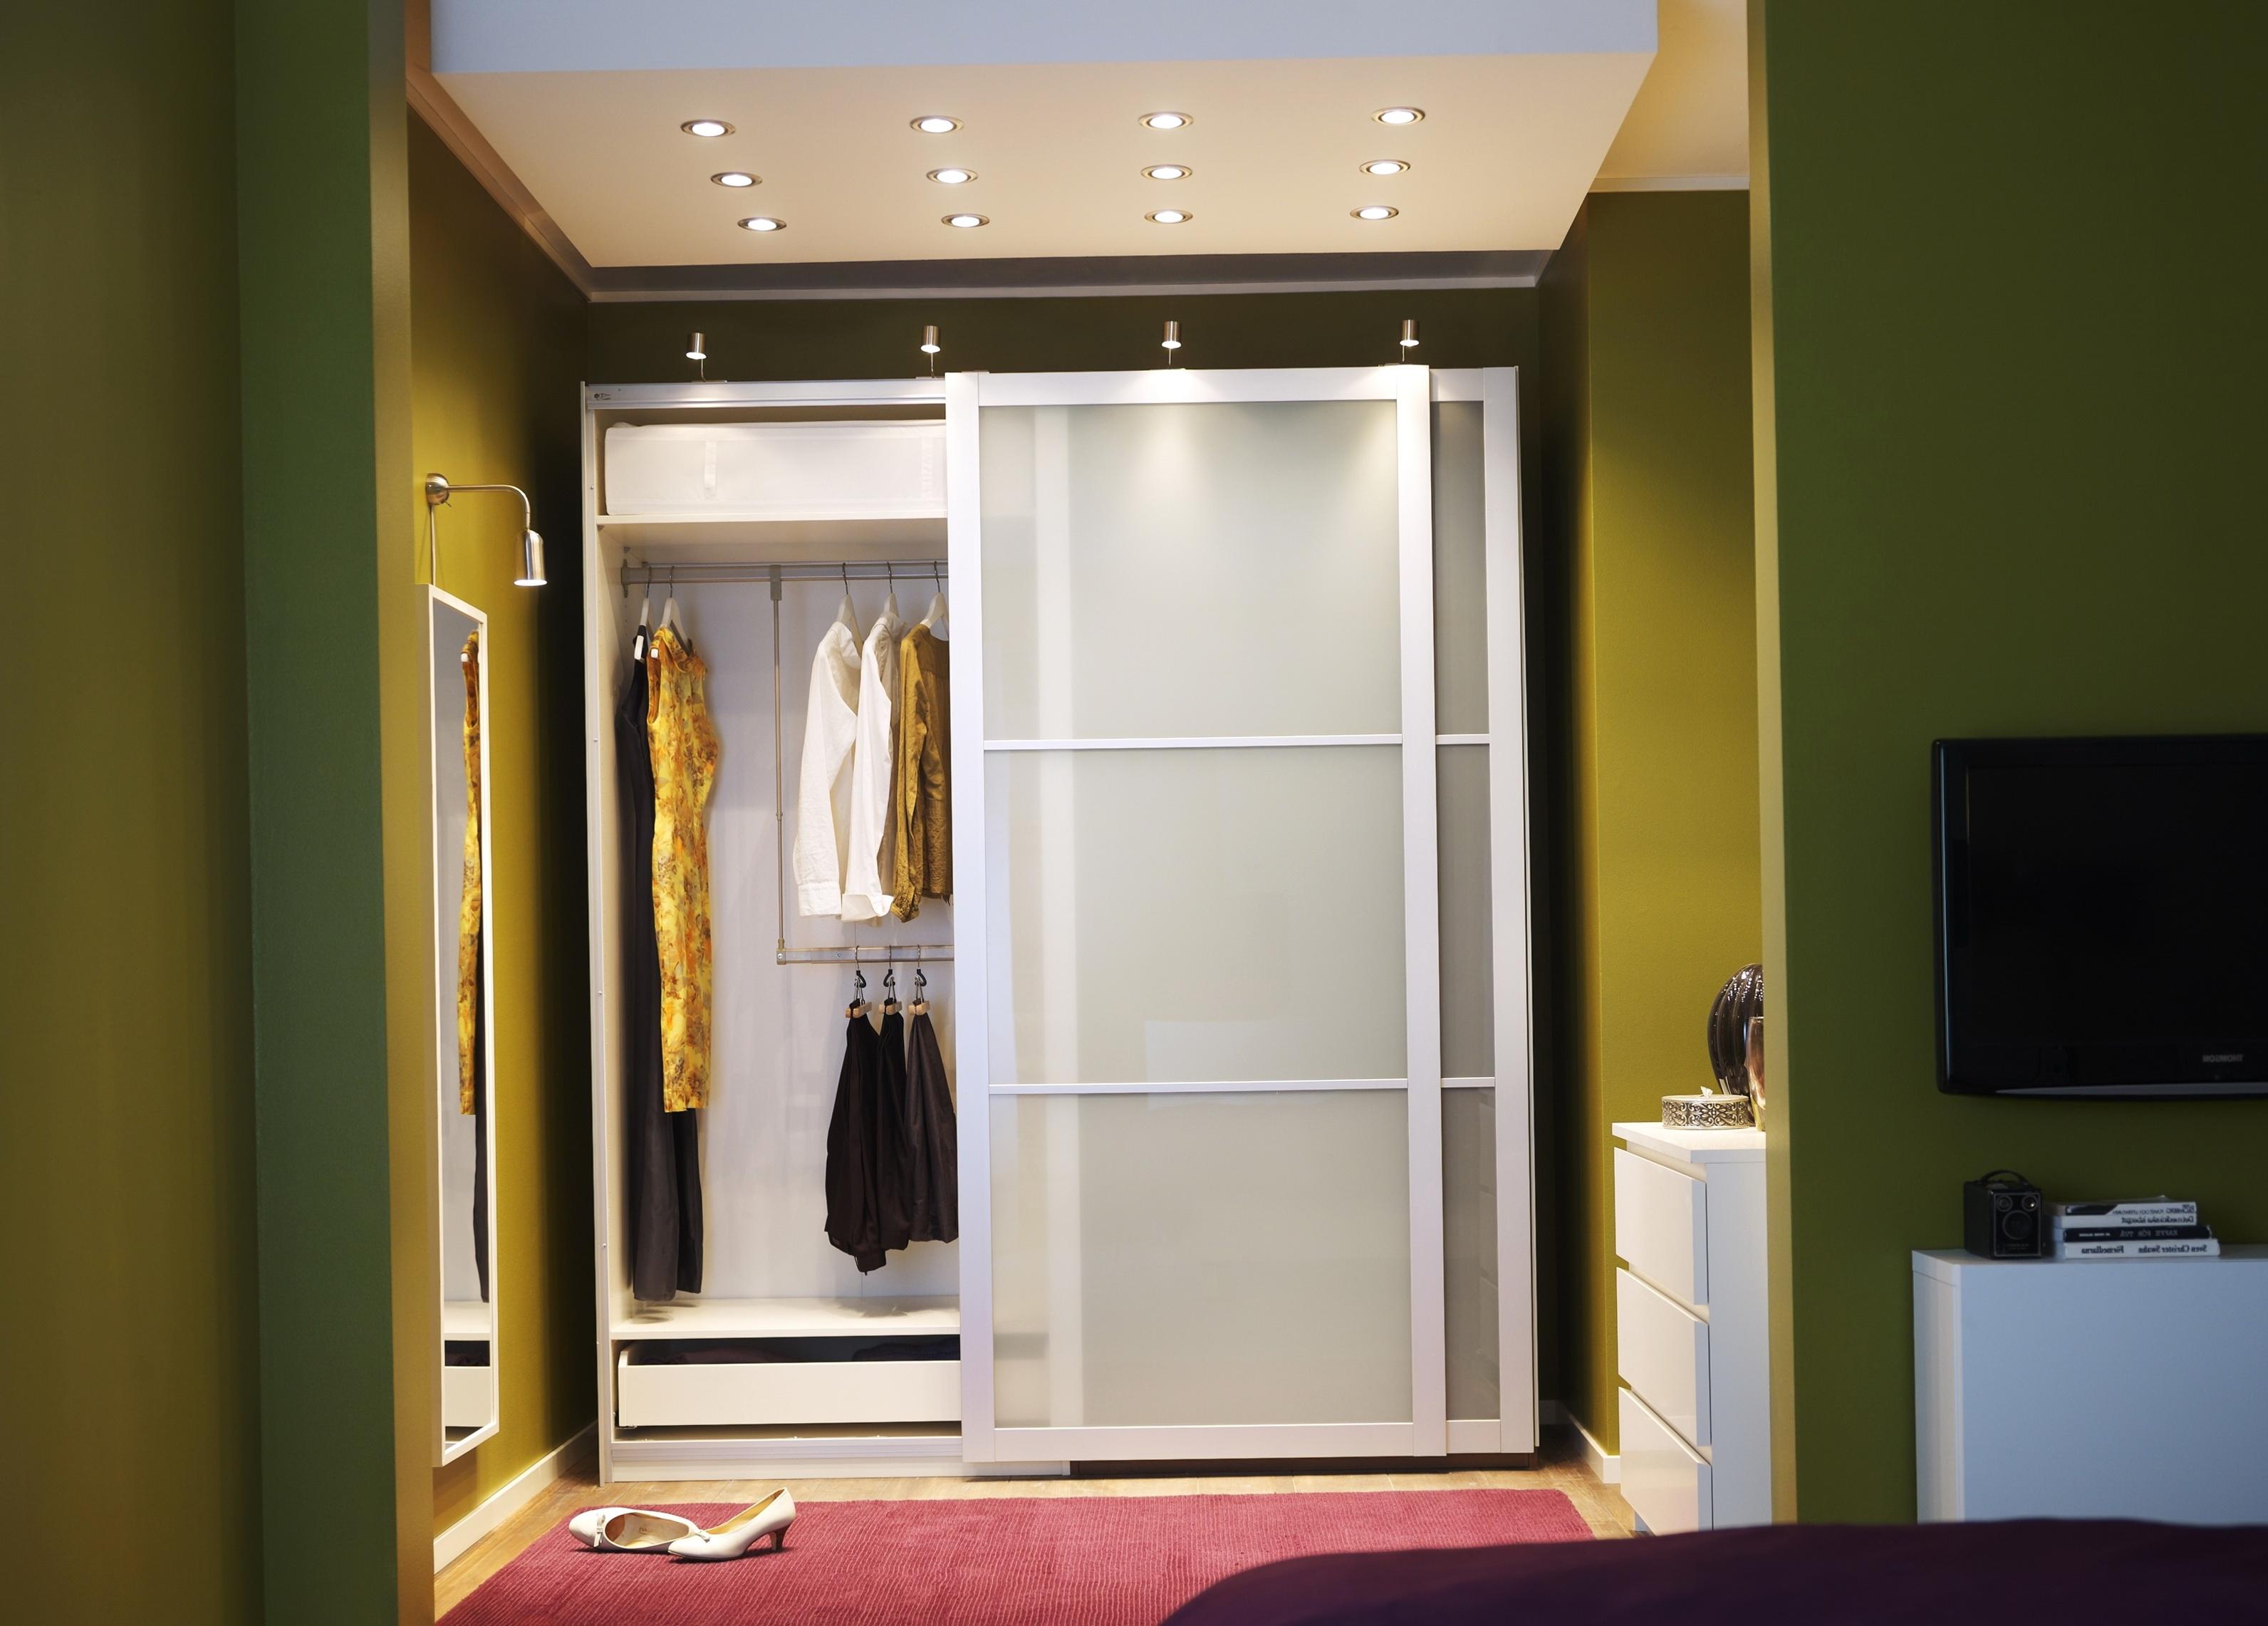 Ikea Panels For Closet Doors